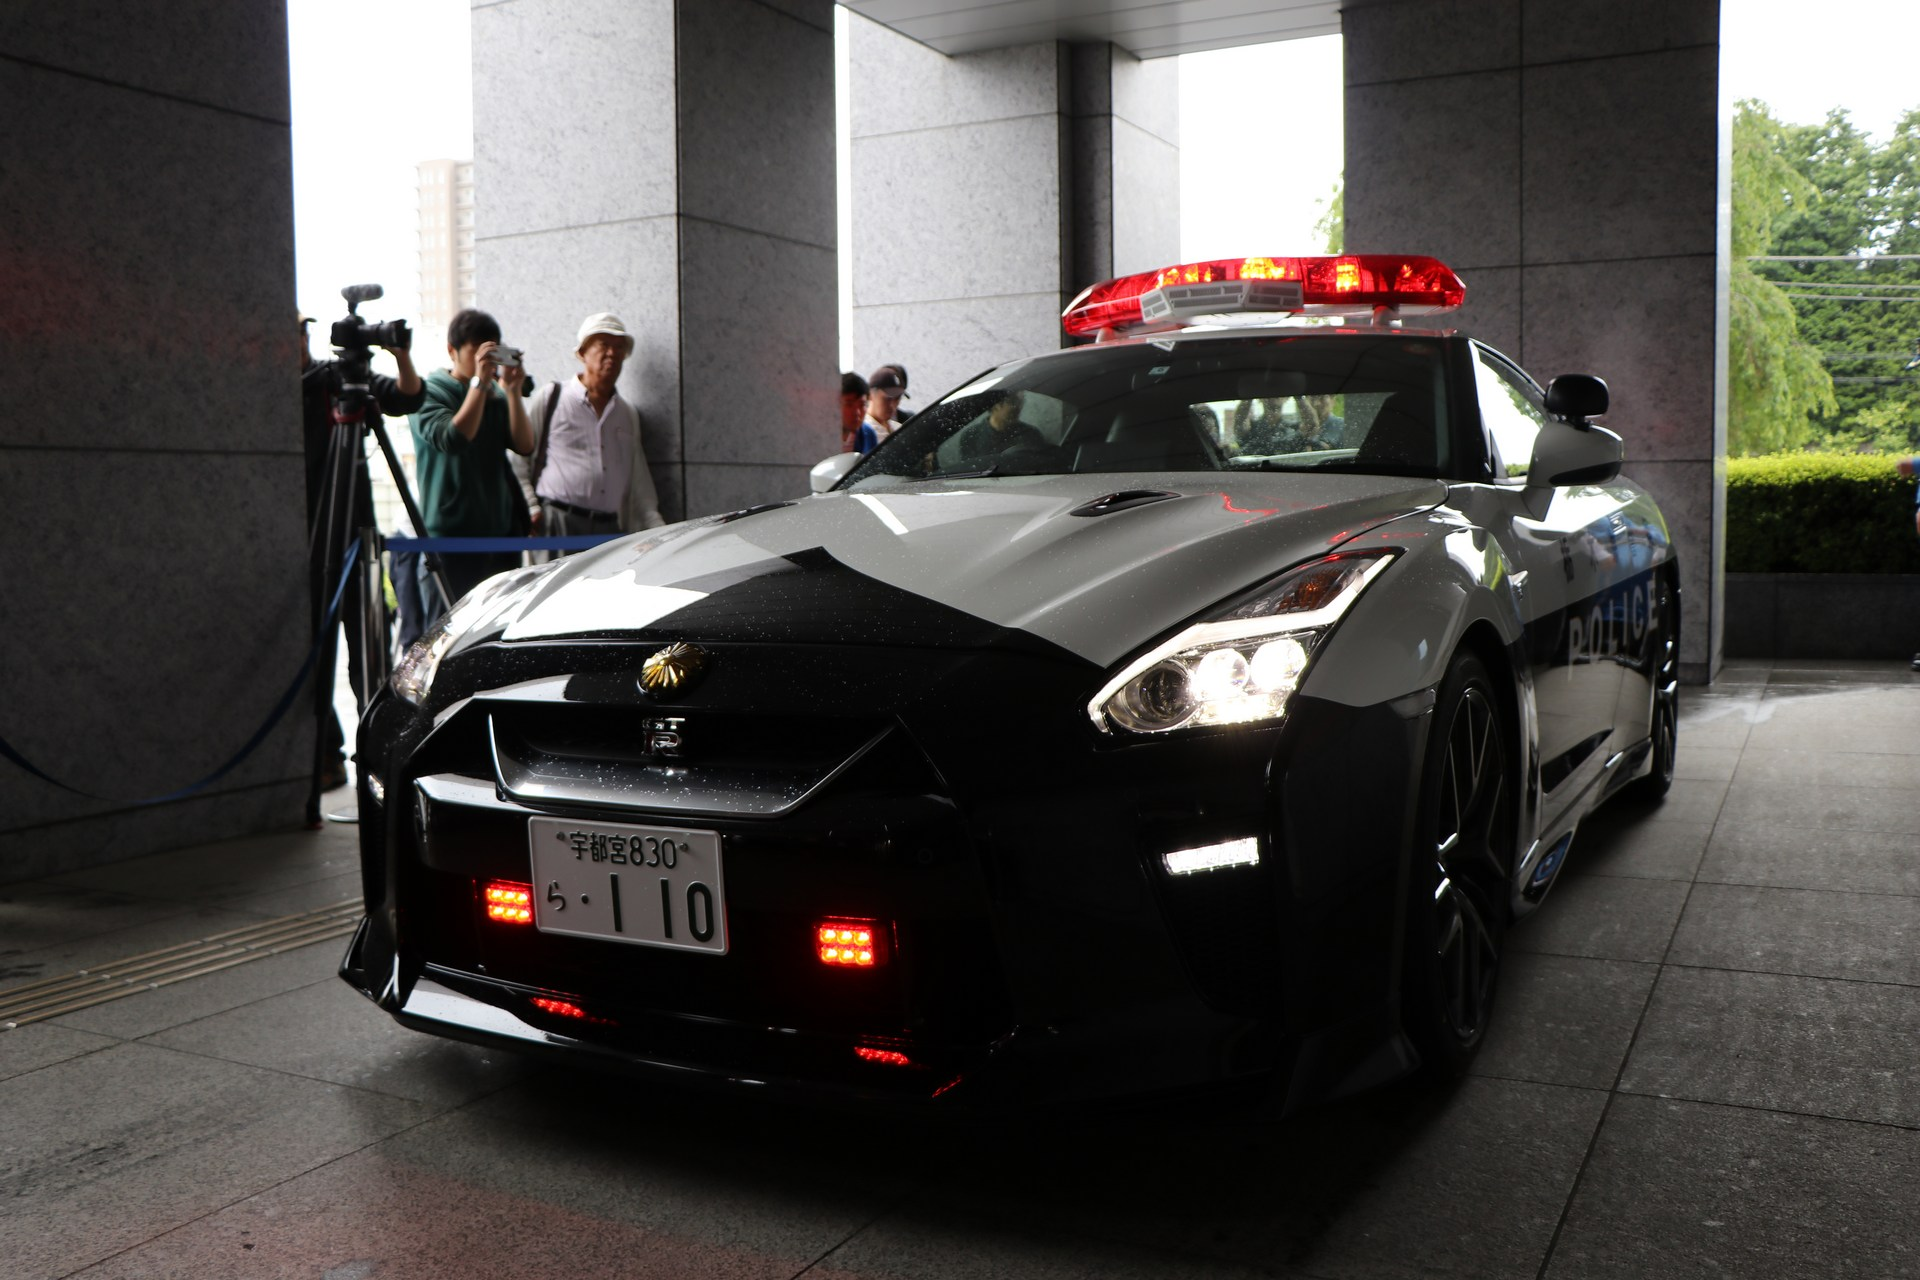 Nissan_GT-R_Police_Car_0014